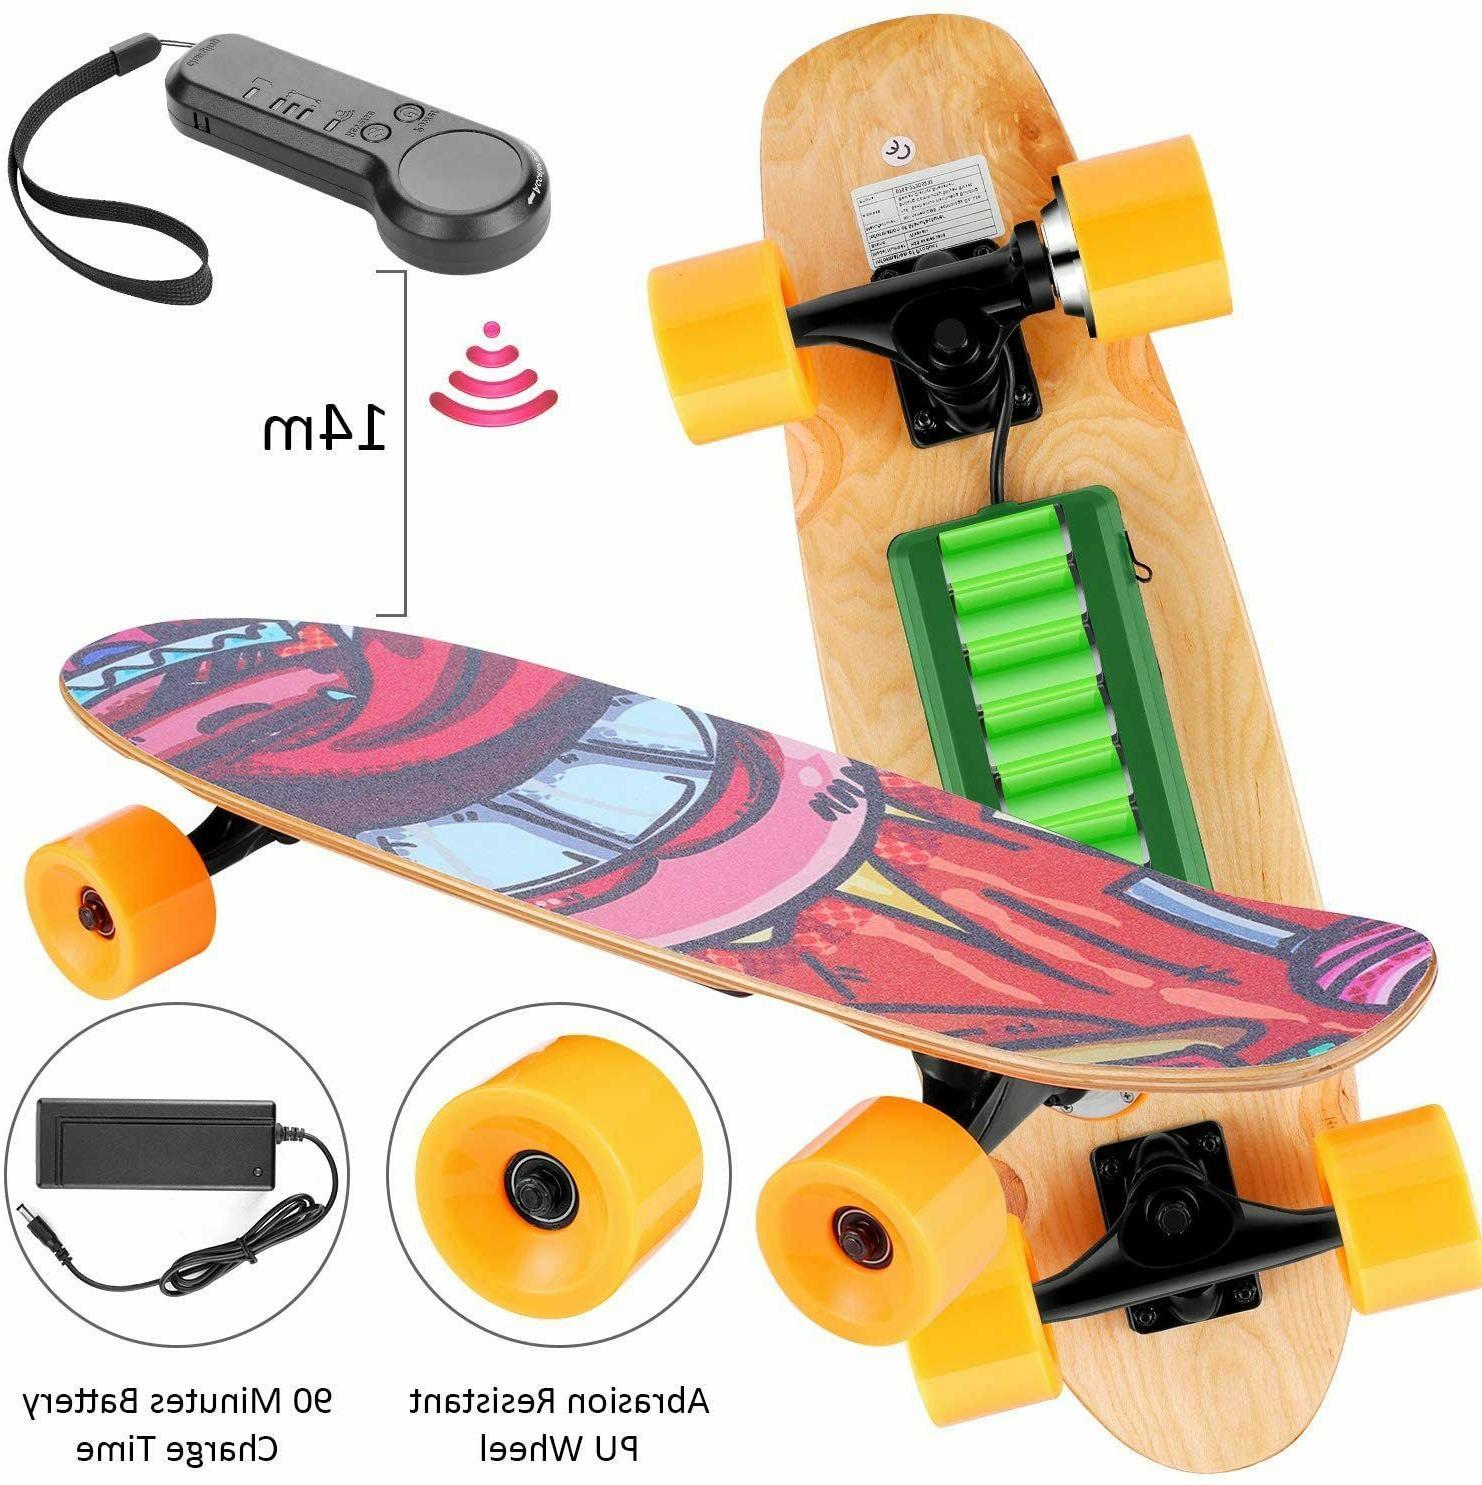 WOOKRAYS Skateboard+Wireless Remote Contro,350W Max Mapl